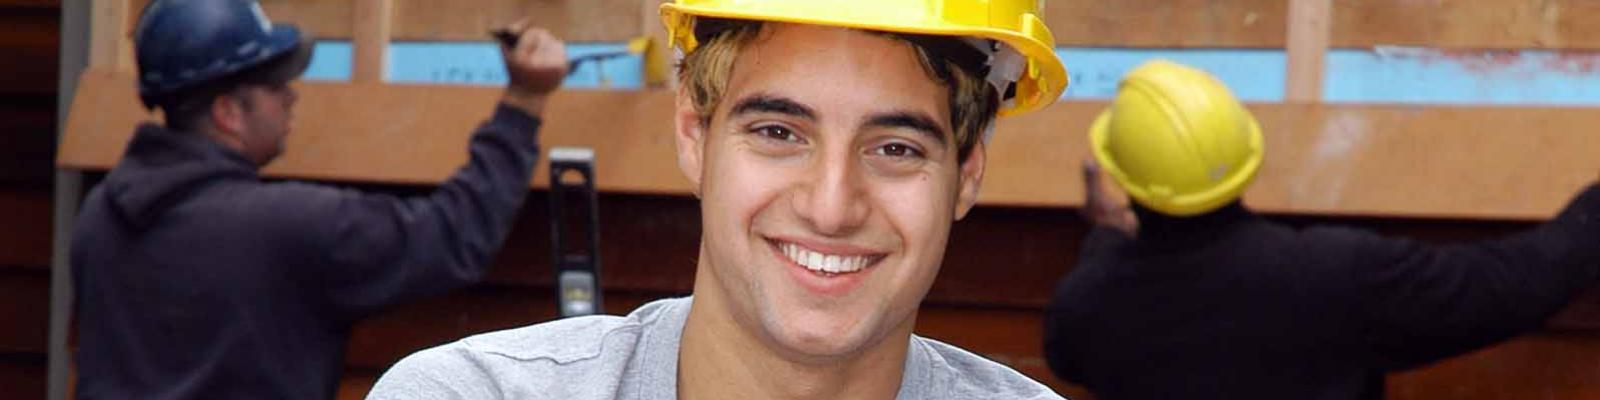 Male apprentice carpenter construction worker